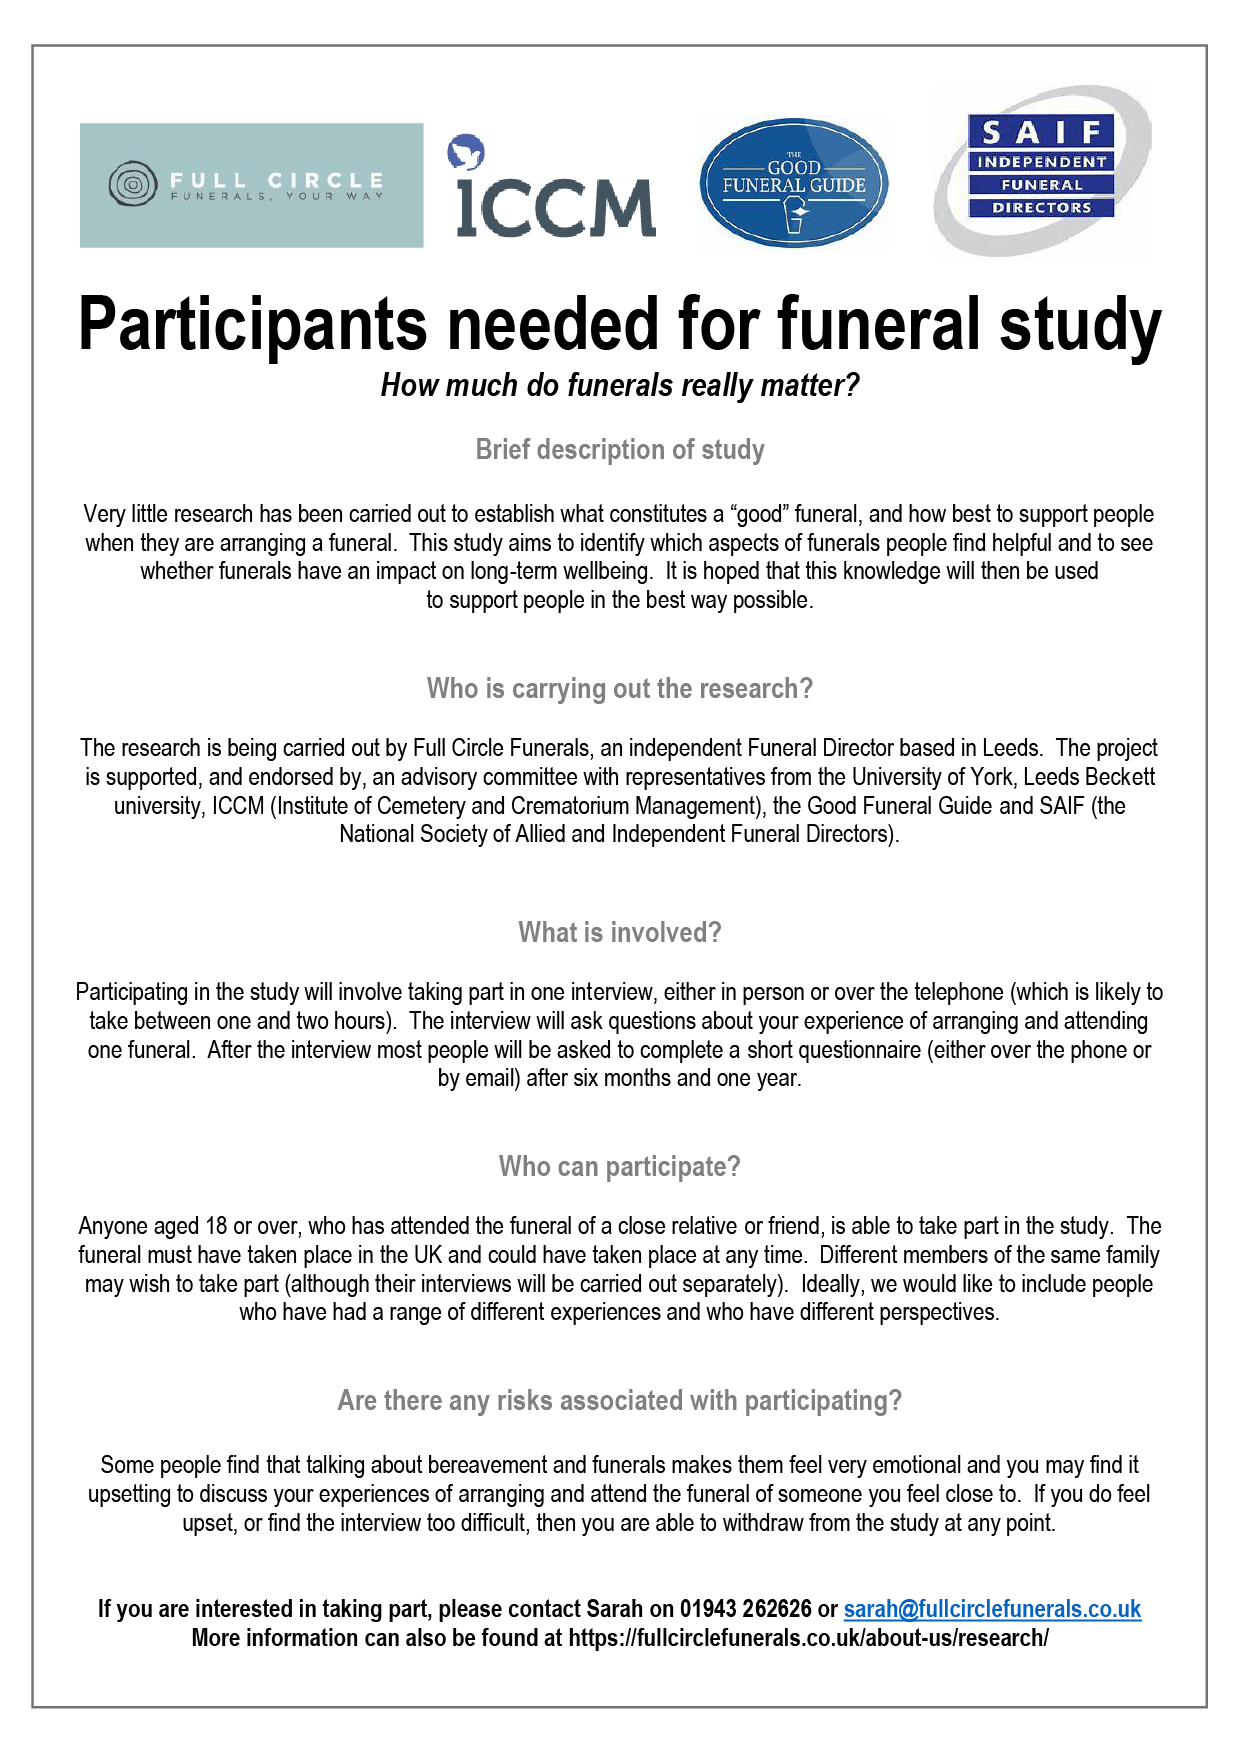 ICCM information